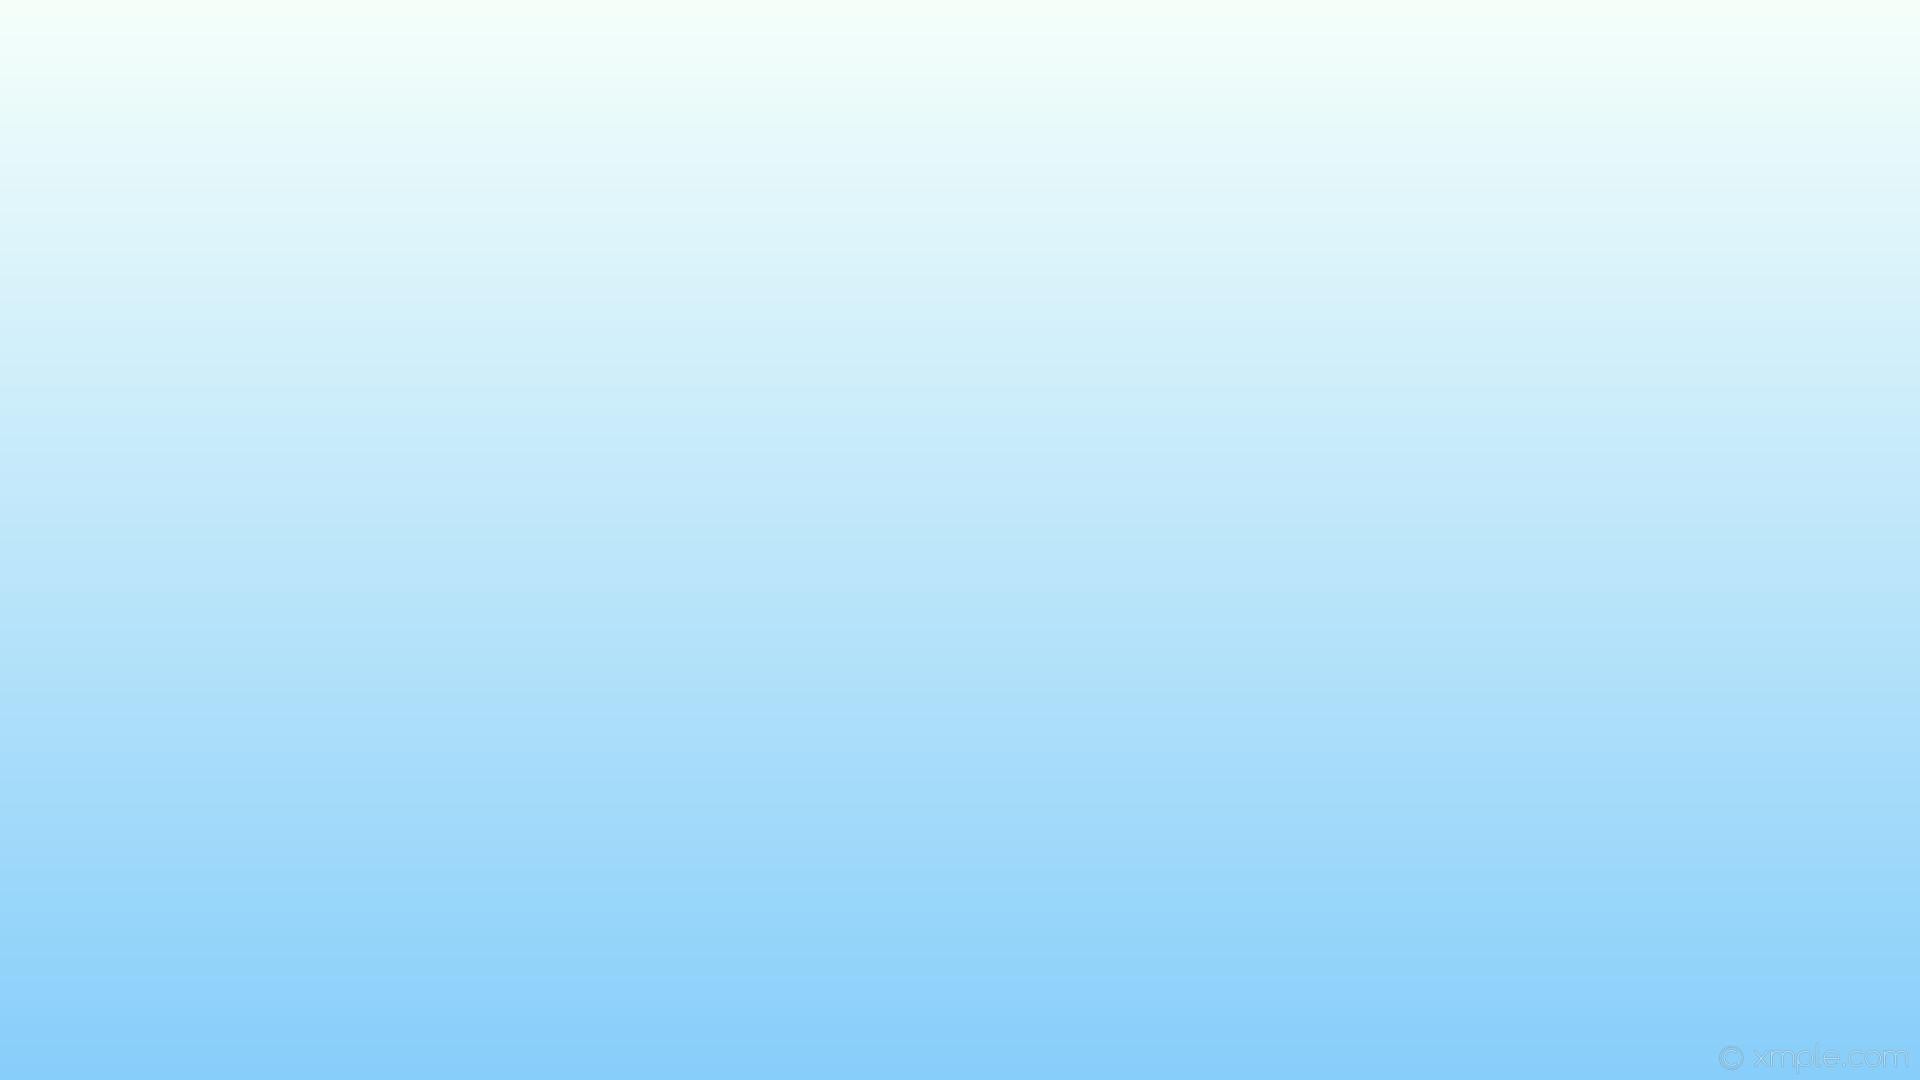 wallpaper white blue gradient linear light sky blue mint cream #87cefa  #f5fffa 270°